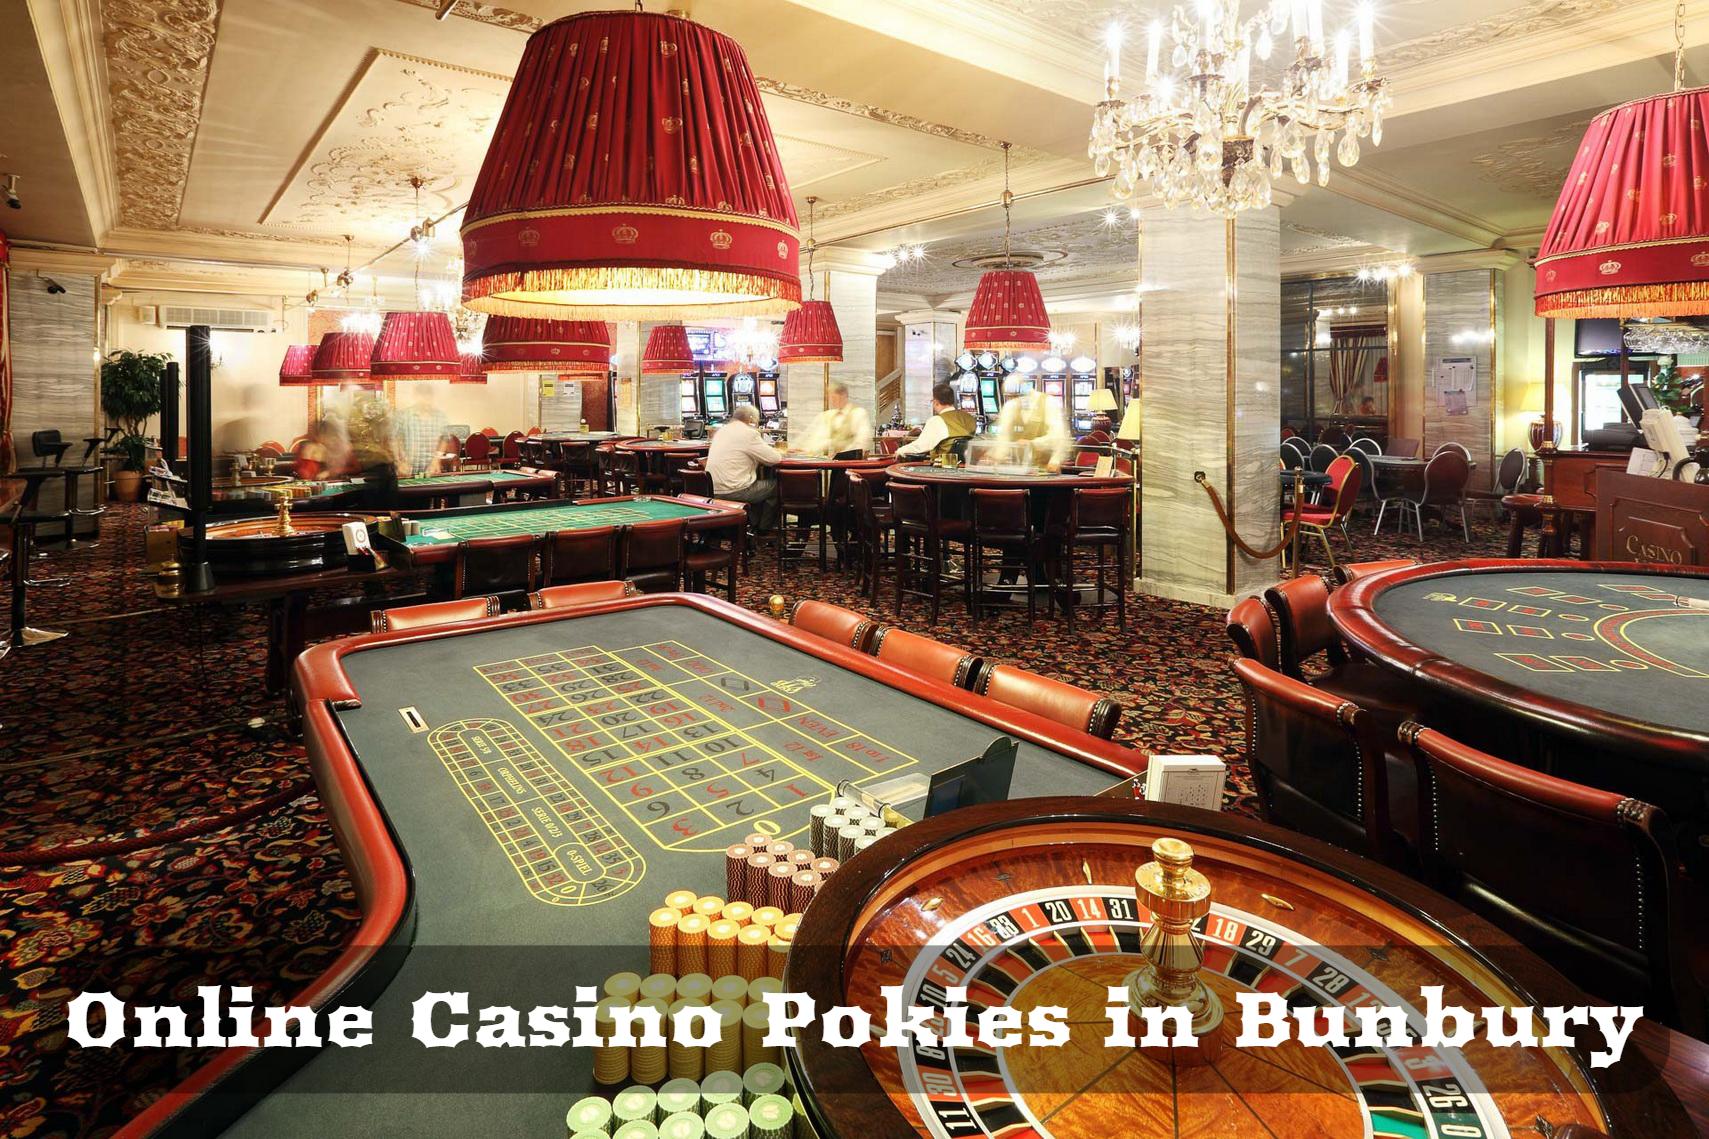 Online Casino Pokies in Bunbury